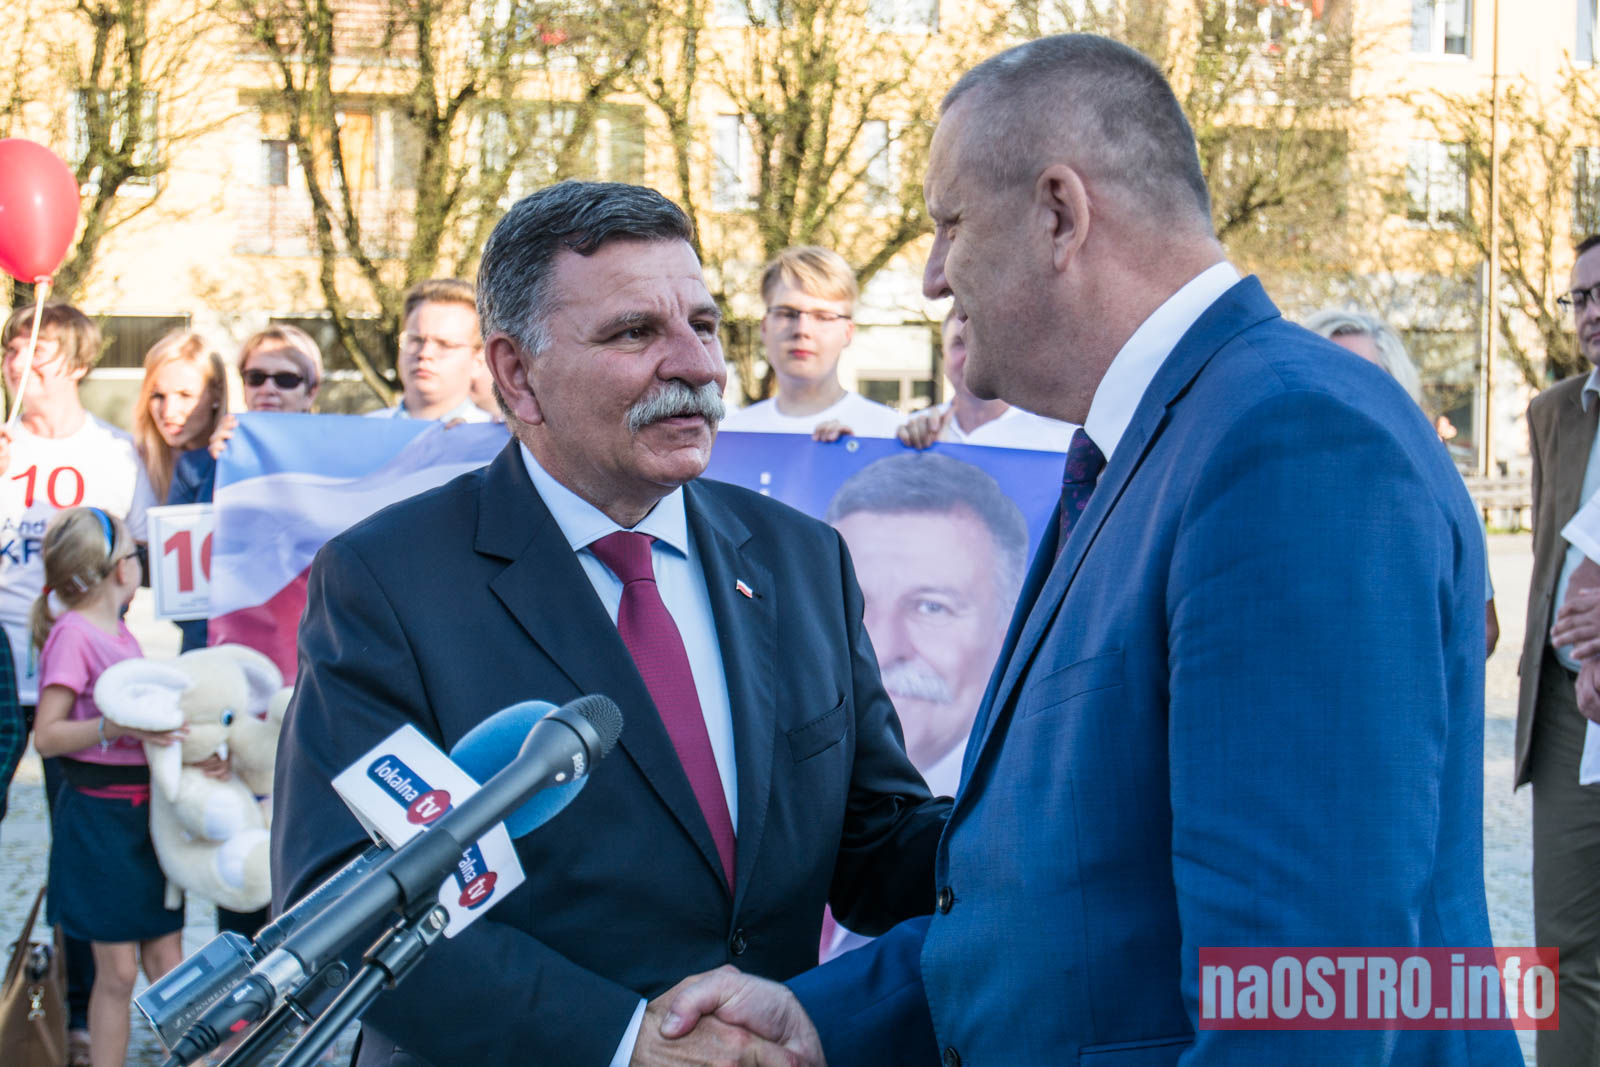 NaOSTRO Andrzej Kryj kampania-21